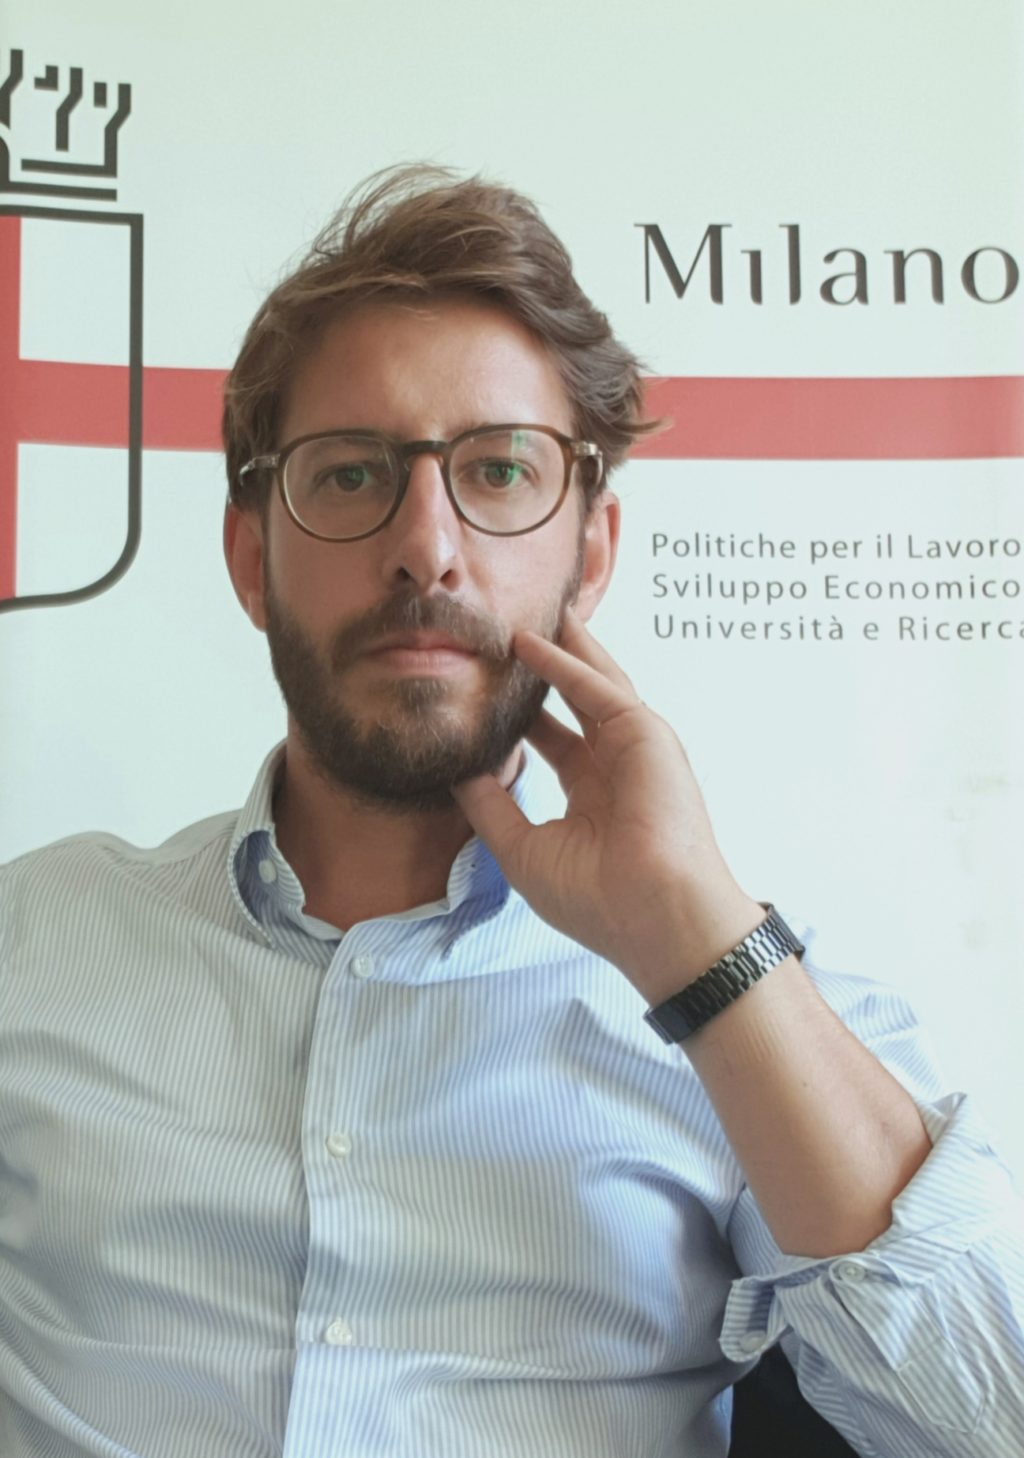 Francesco Pizzorni